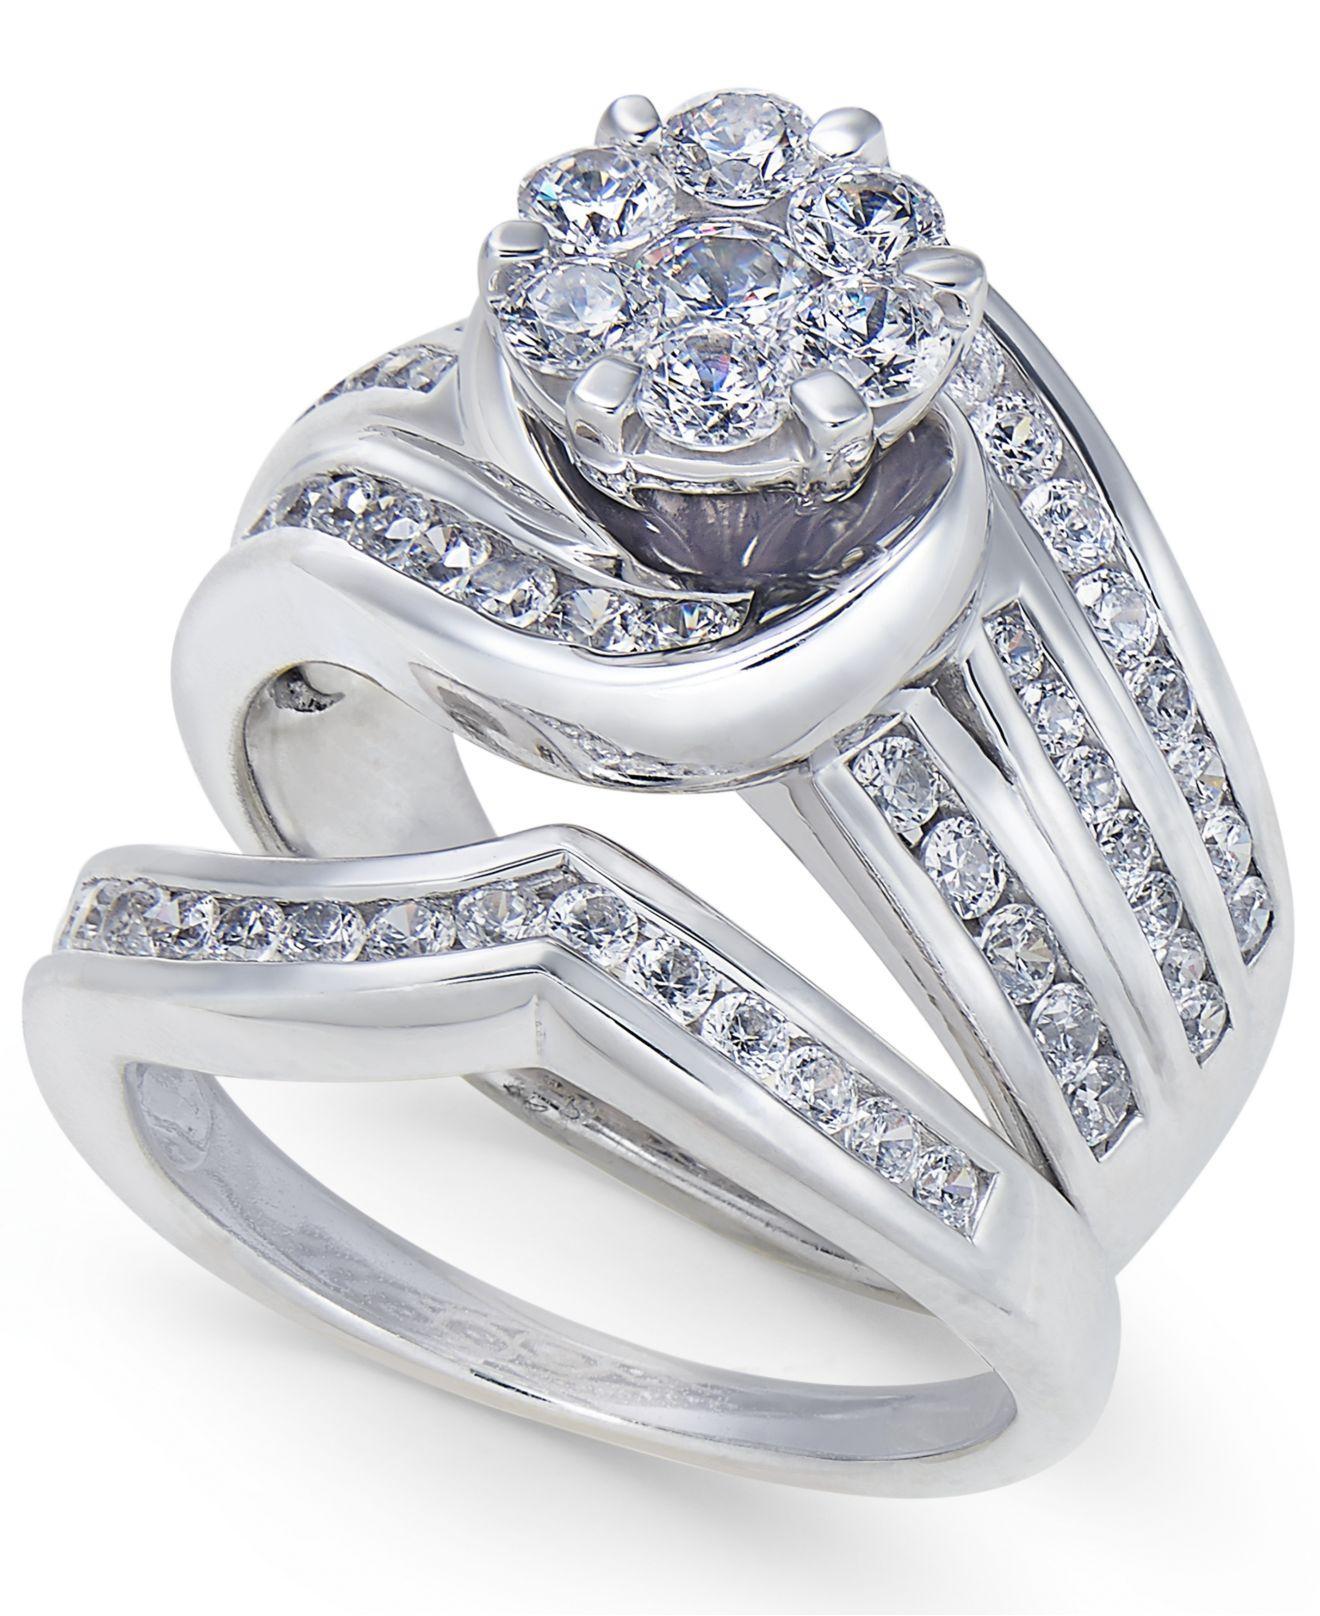 Macy s Diamond Swirl Cluster Bridal Set 2 Ct T w In 14k White